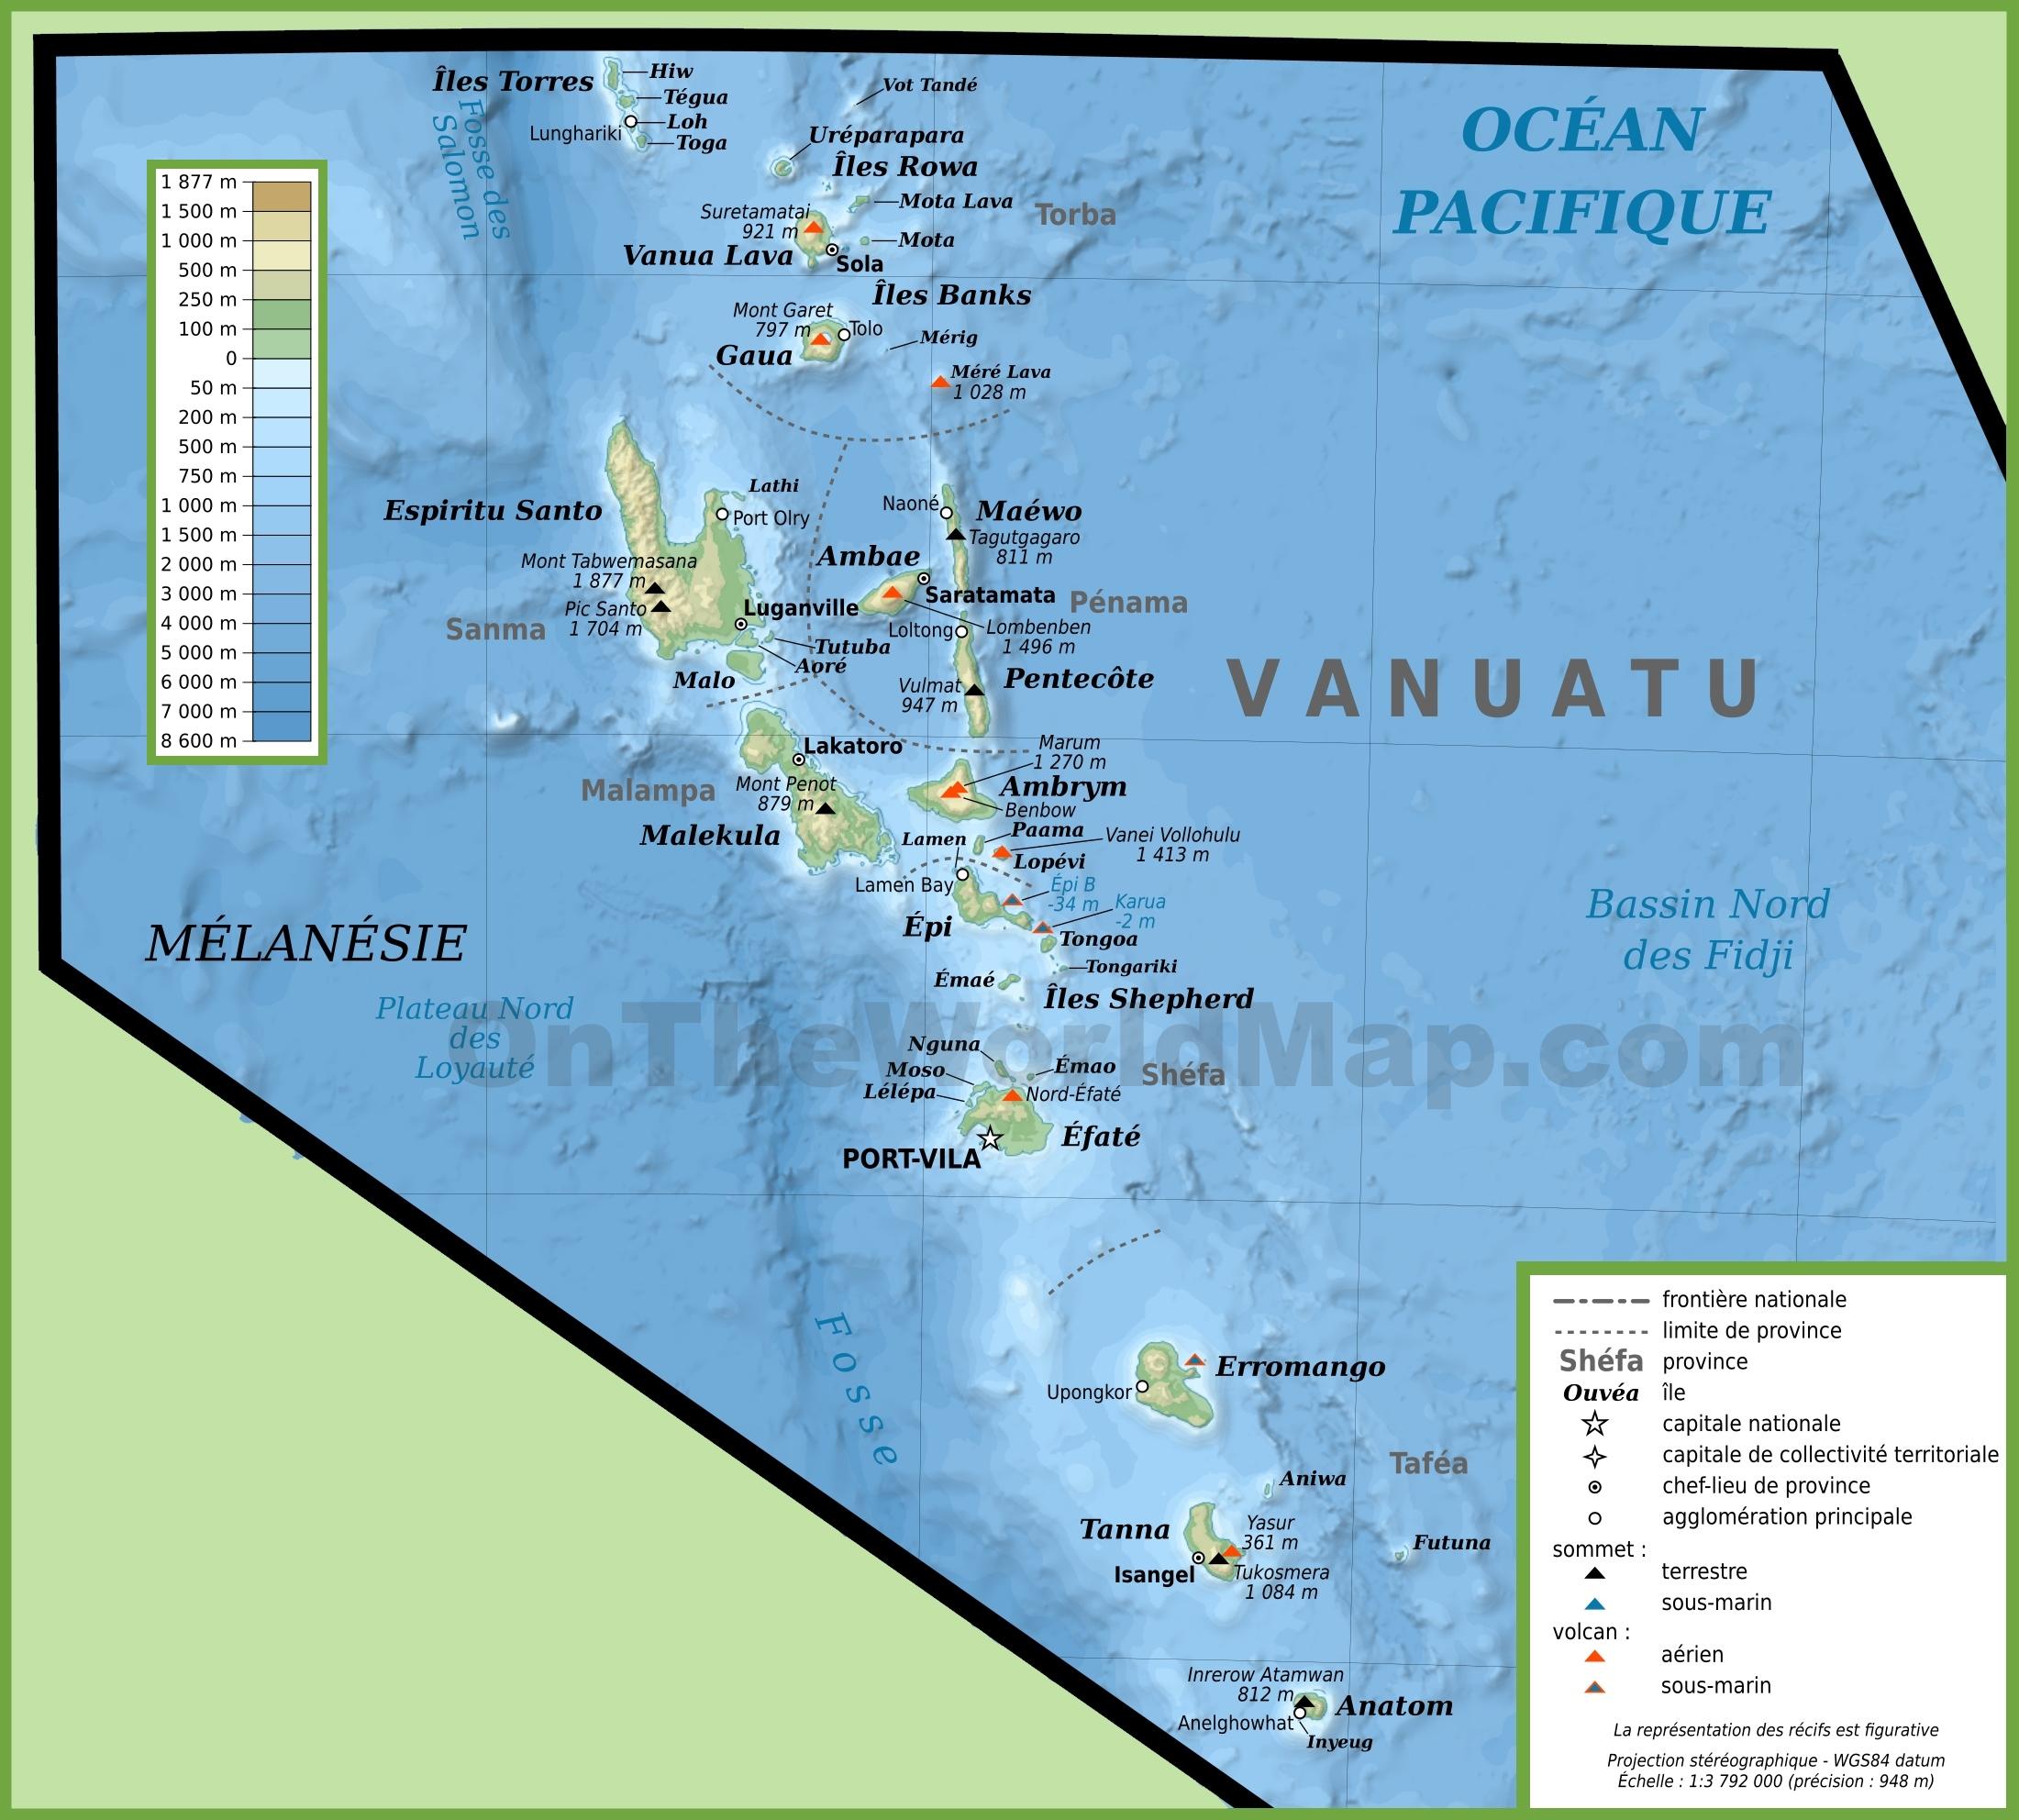 Vanuatu maps maps of vanuatu physical map of vanuatu islands gumiabroncs Gallery